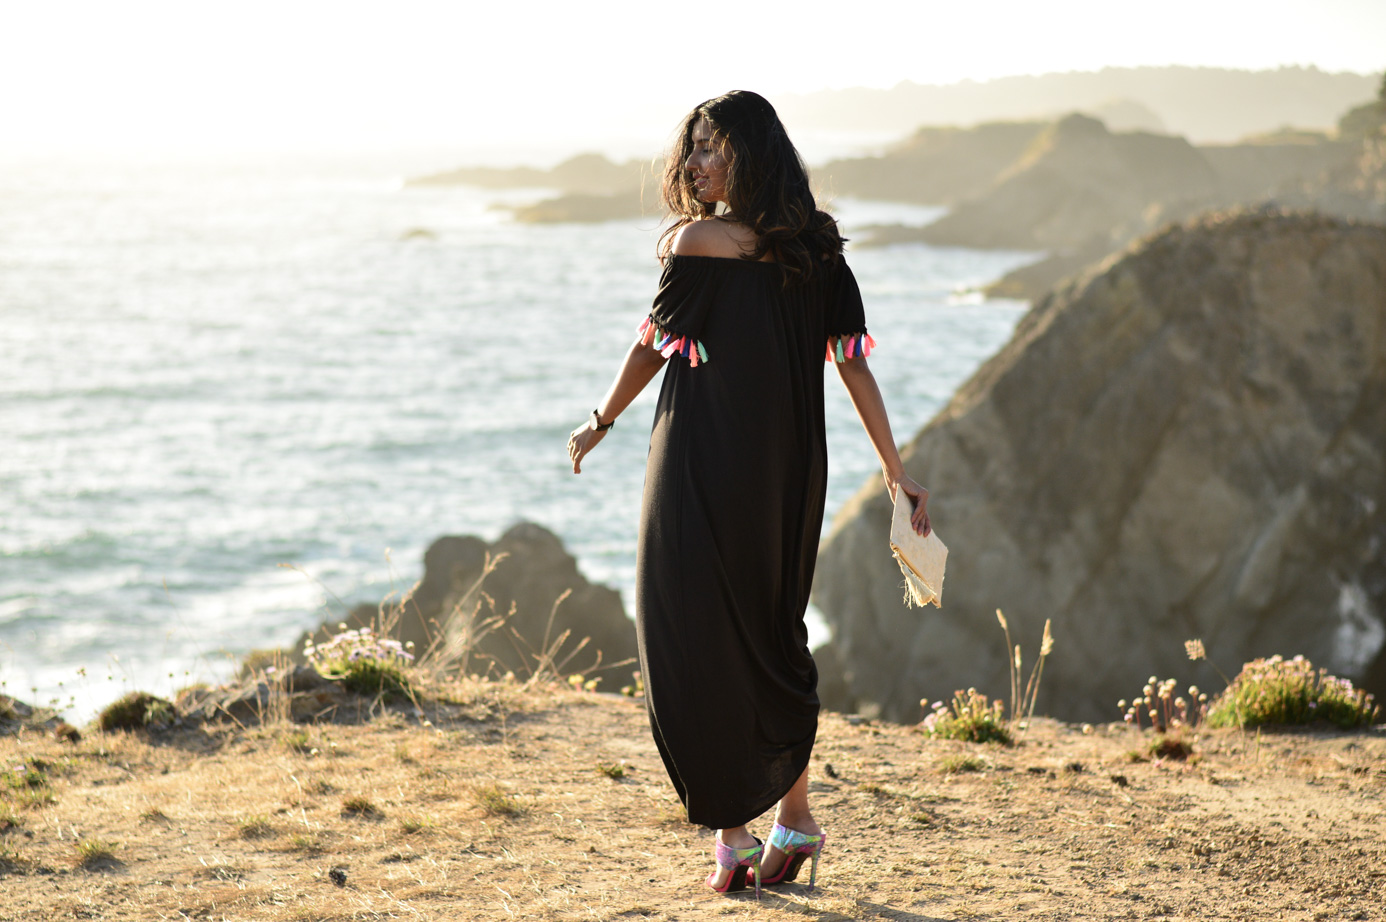 mendocino-little-river-inn-maxi-dress-tassels-vacation-style 1